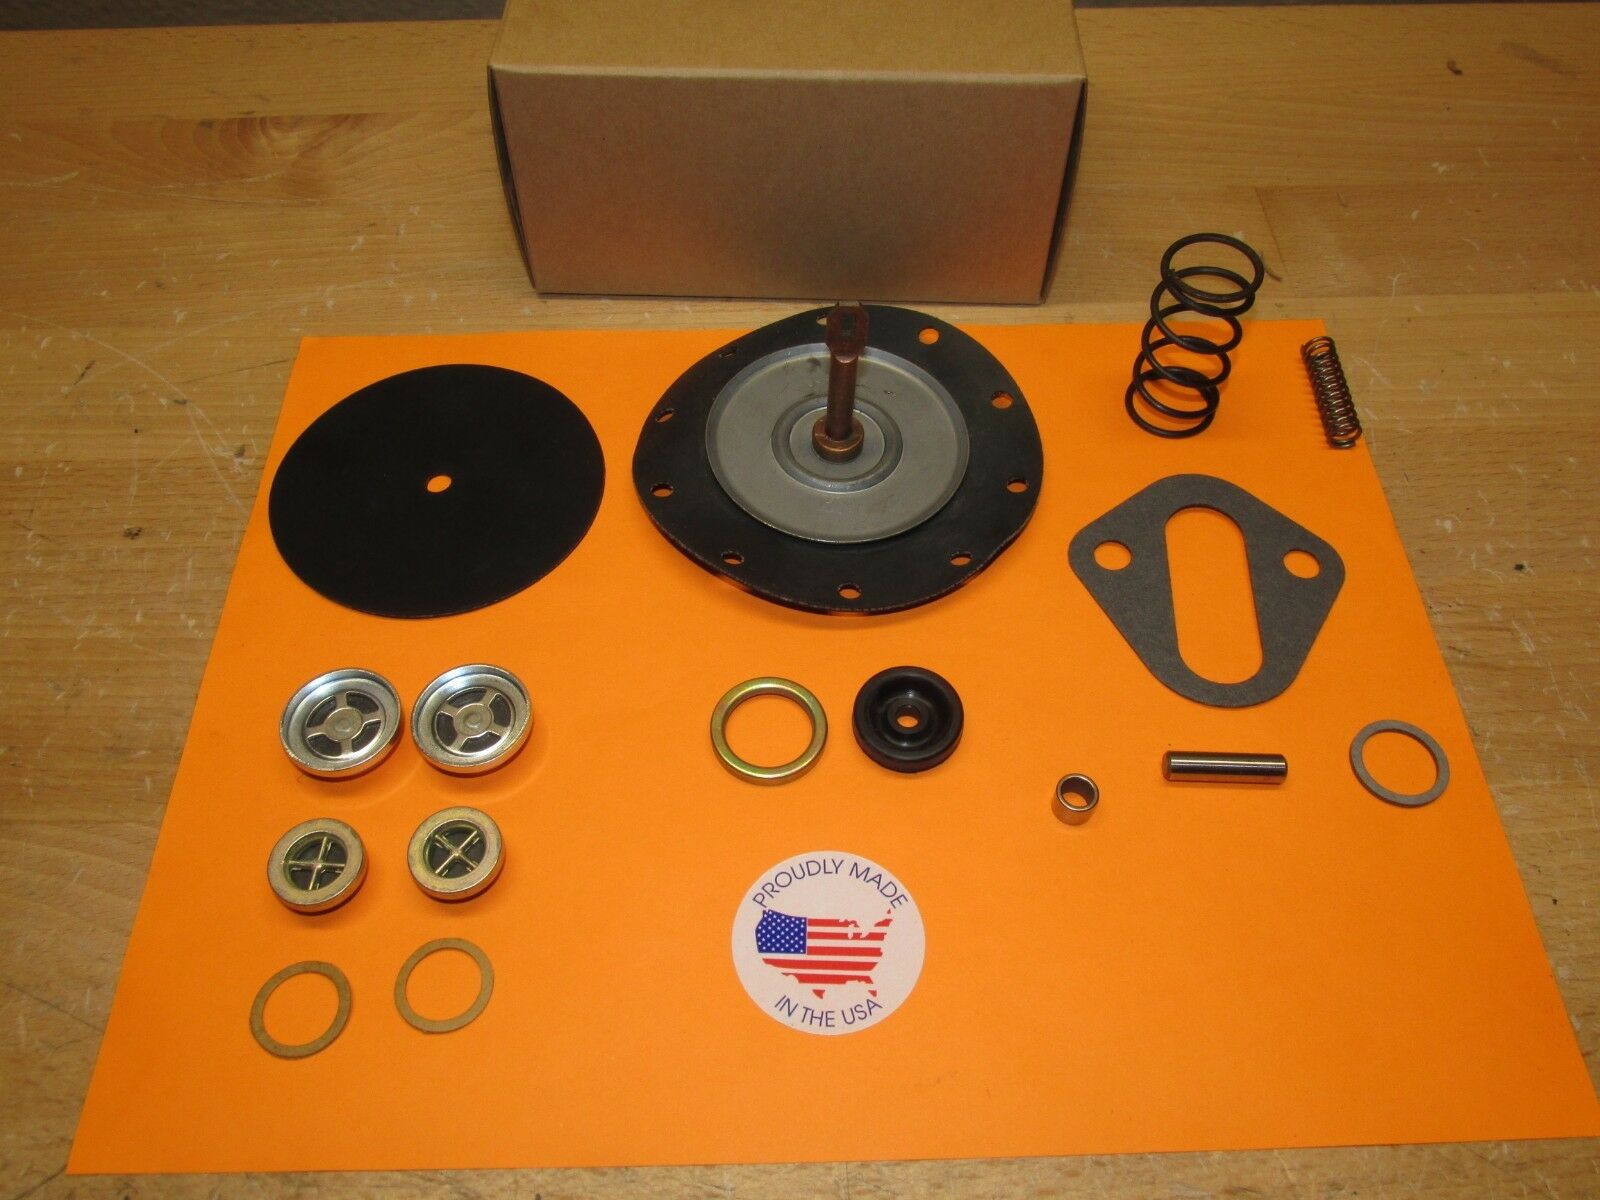 1955 1957 1958 1959 GMC Truck V8 Engine Single Action Modern Fuel Pump Kit  USA